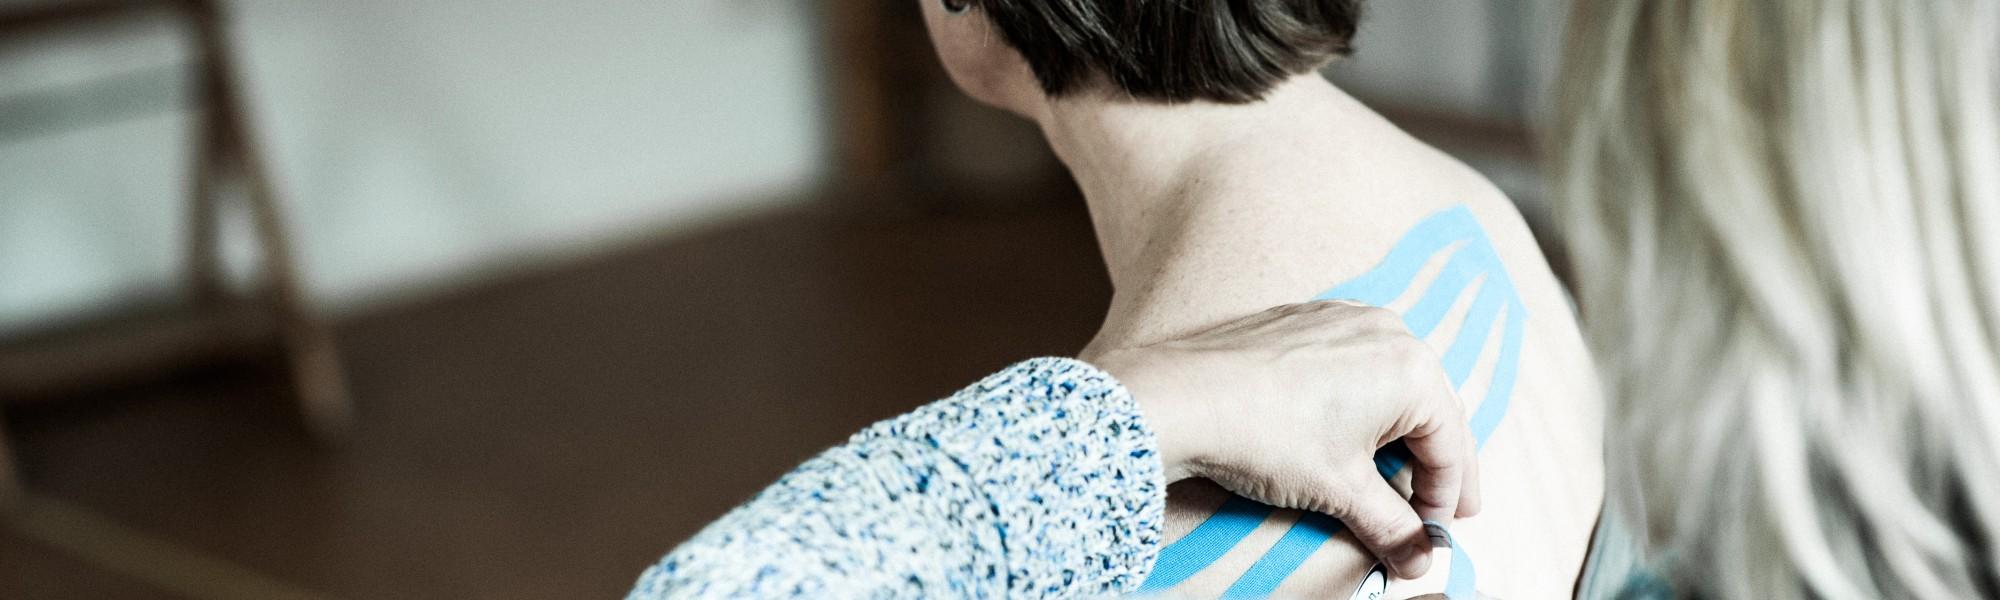 Fysiotherapie Driebergen Fysiotherapie Driebergen Fysiotherapie Driebergen Oedeemfysiotherapie